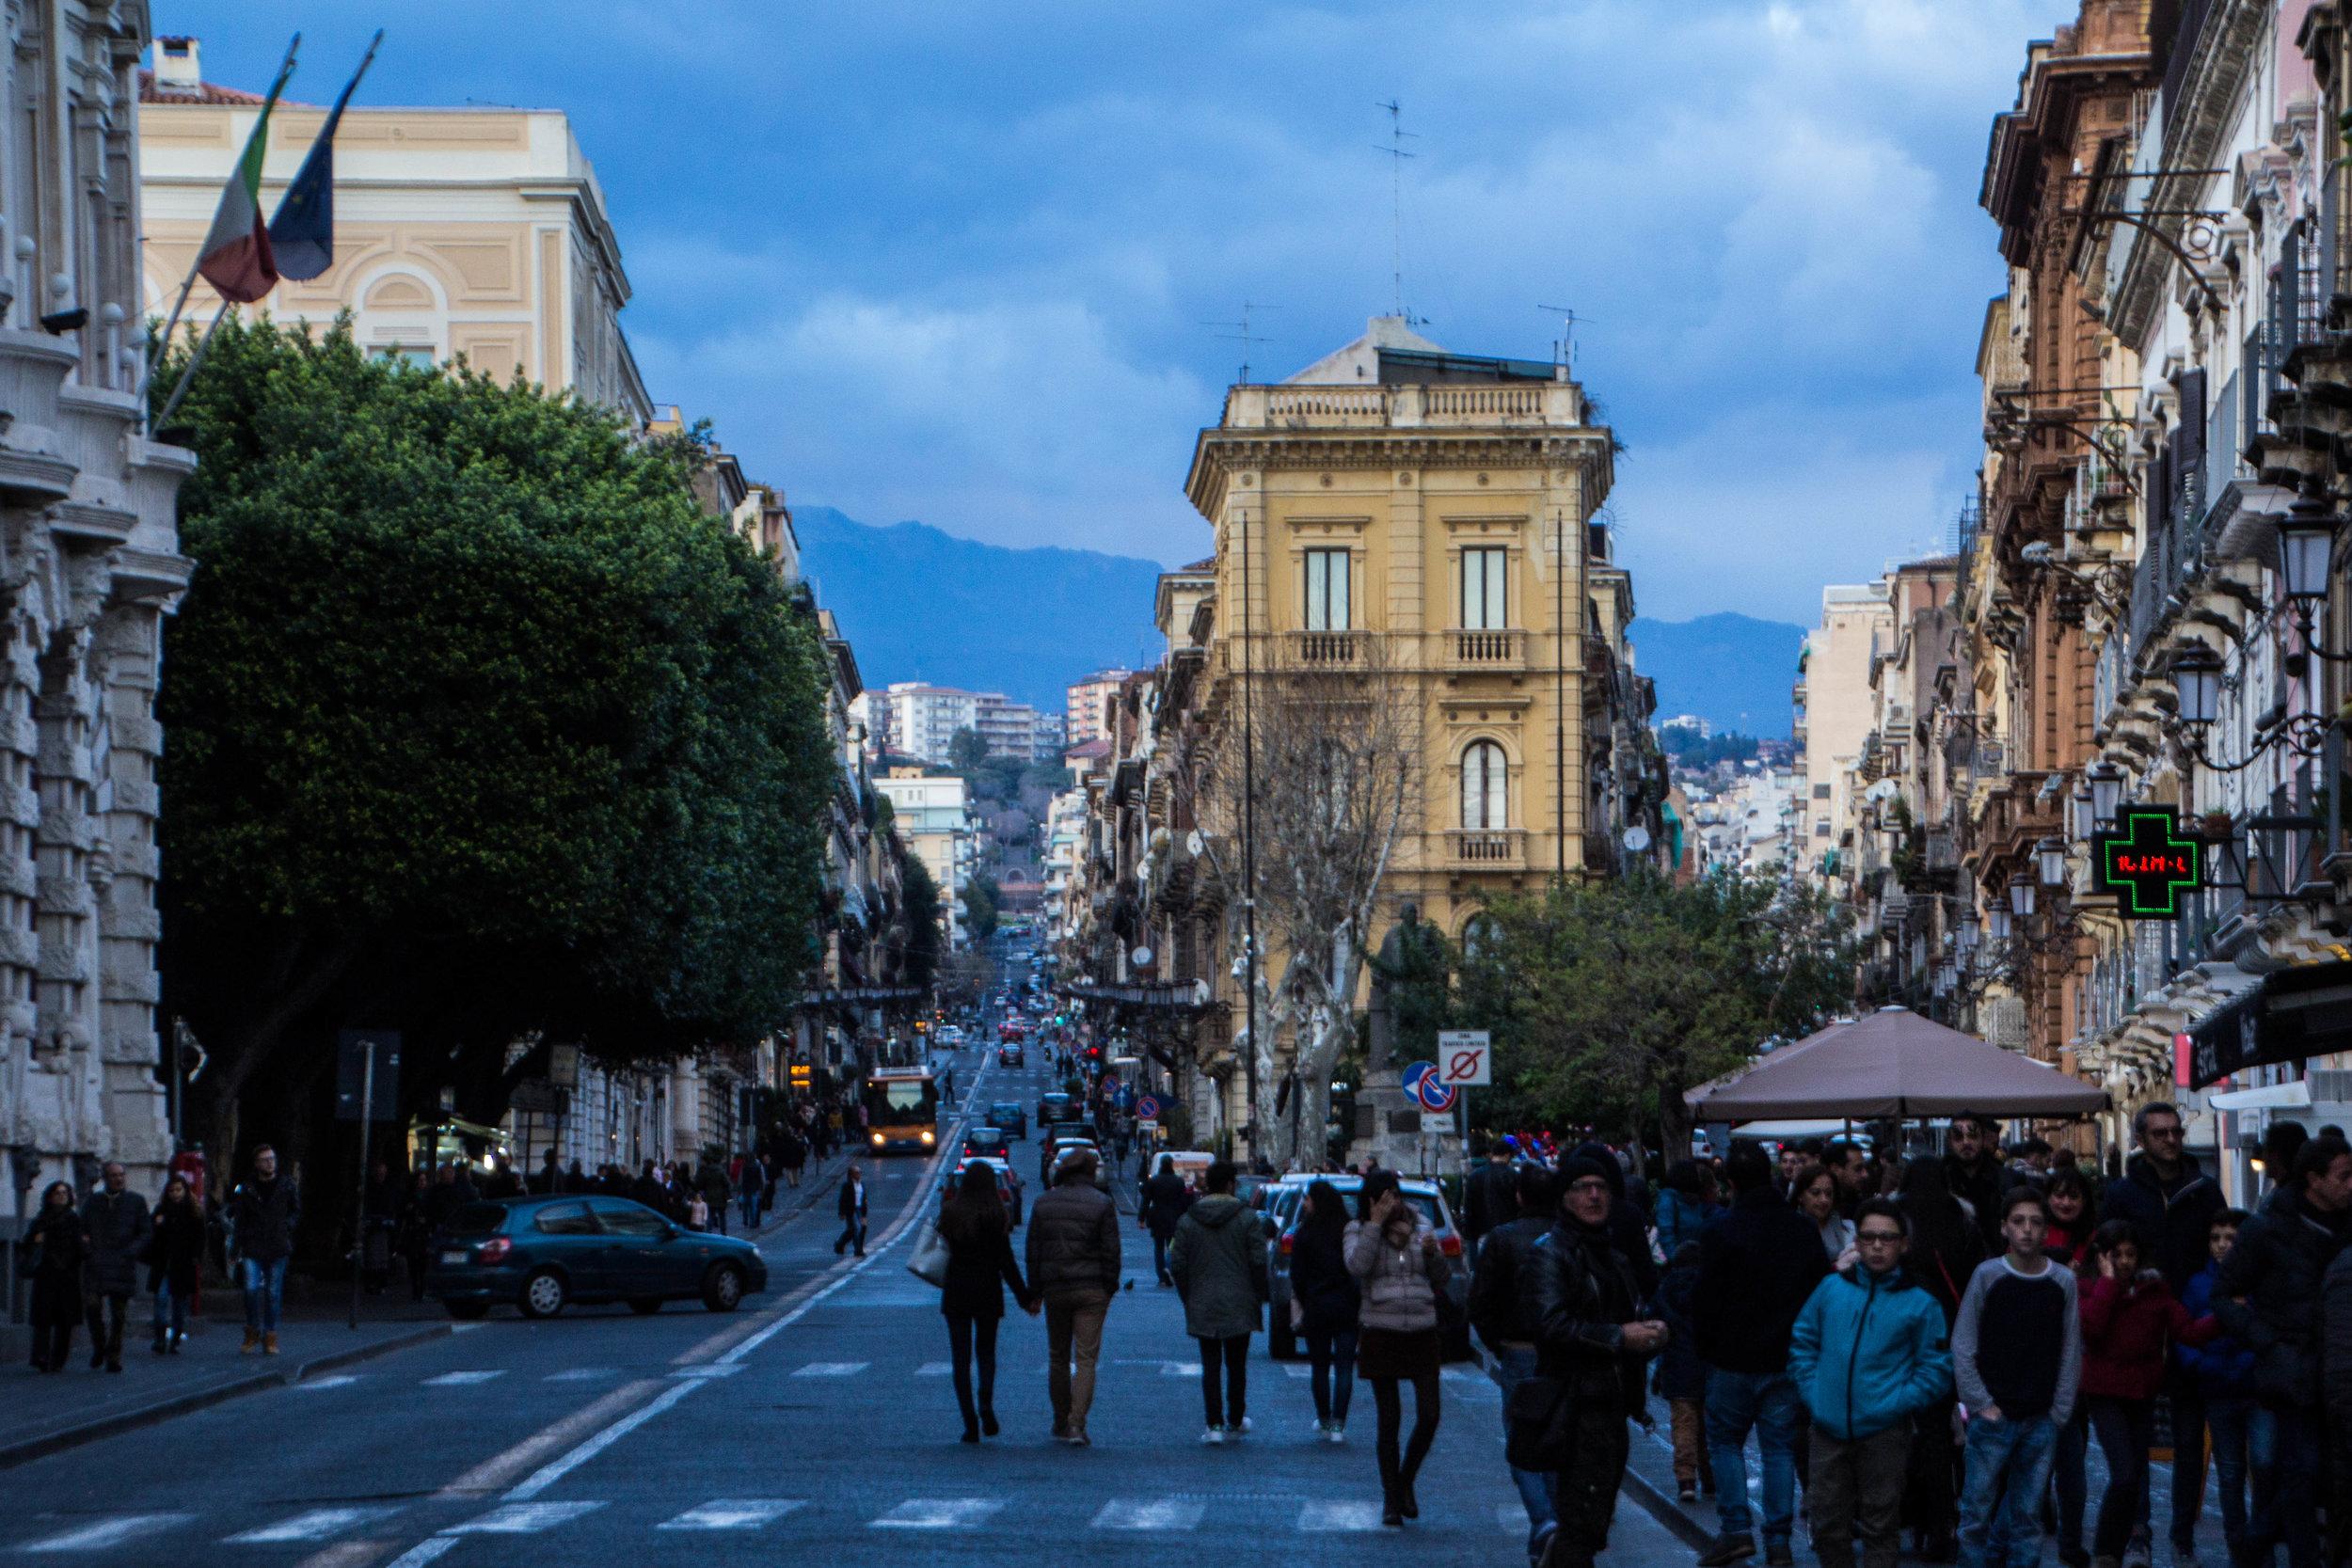 streets-catania-sicily-sicilia-7.jpg